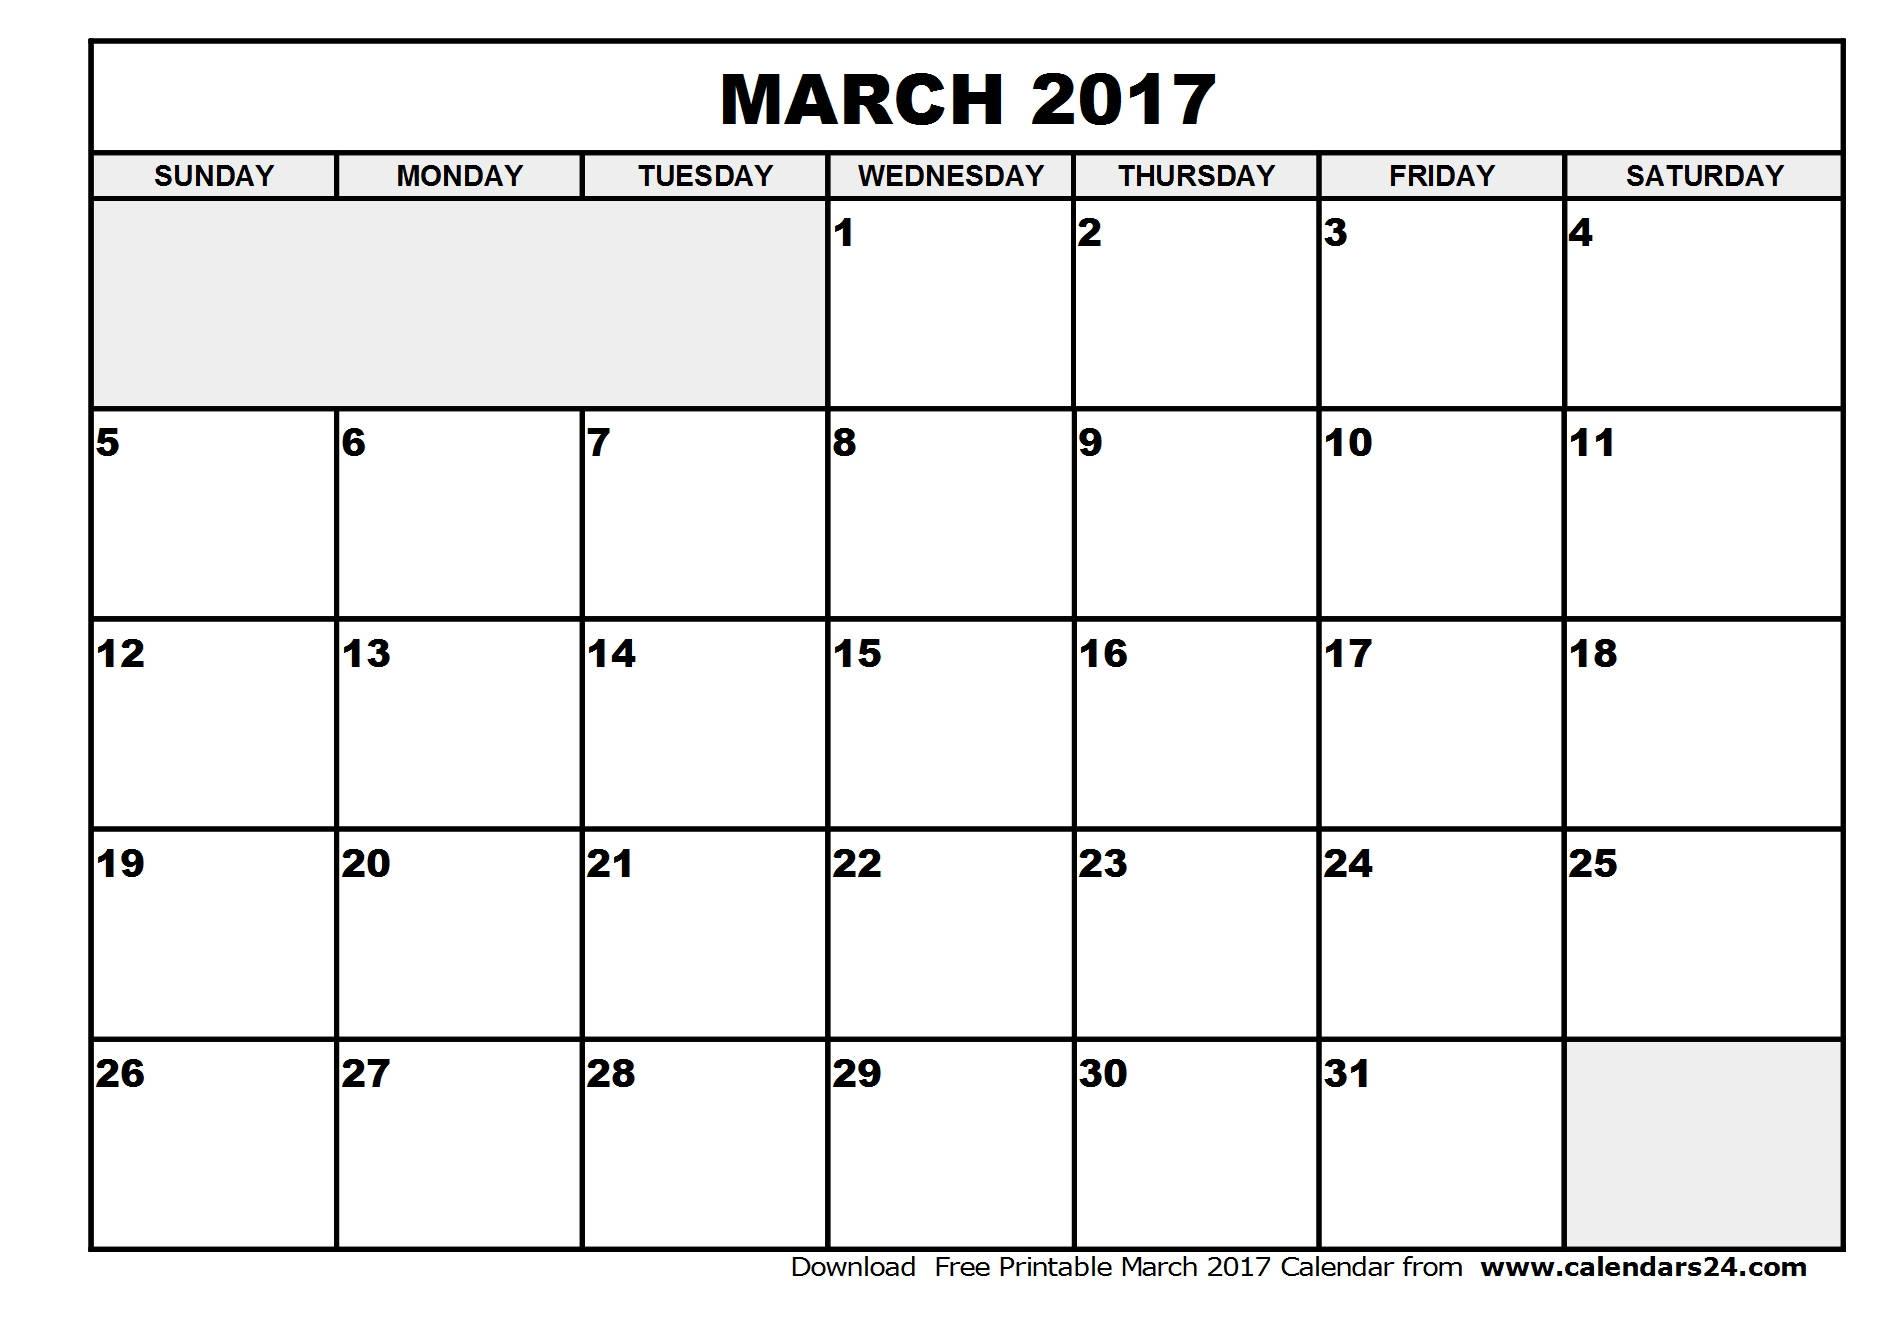 March 2017 Calendar & April 2017 Calendar